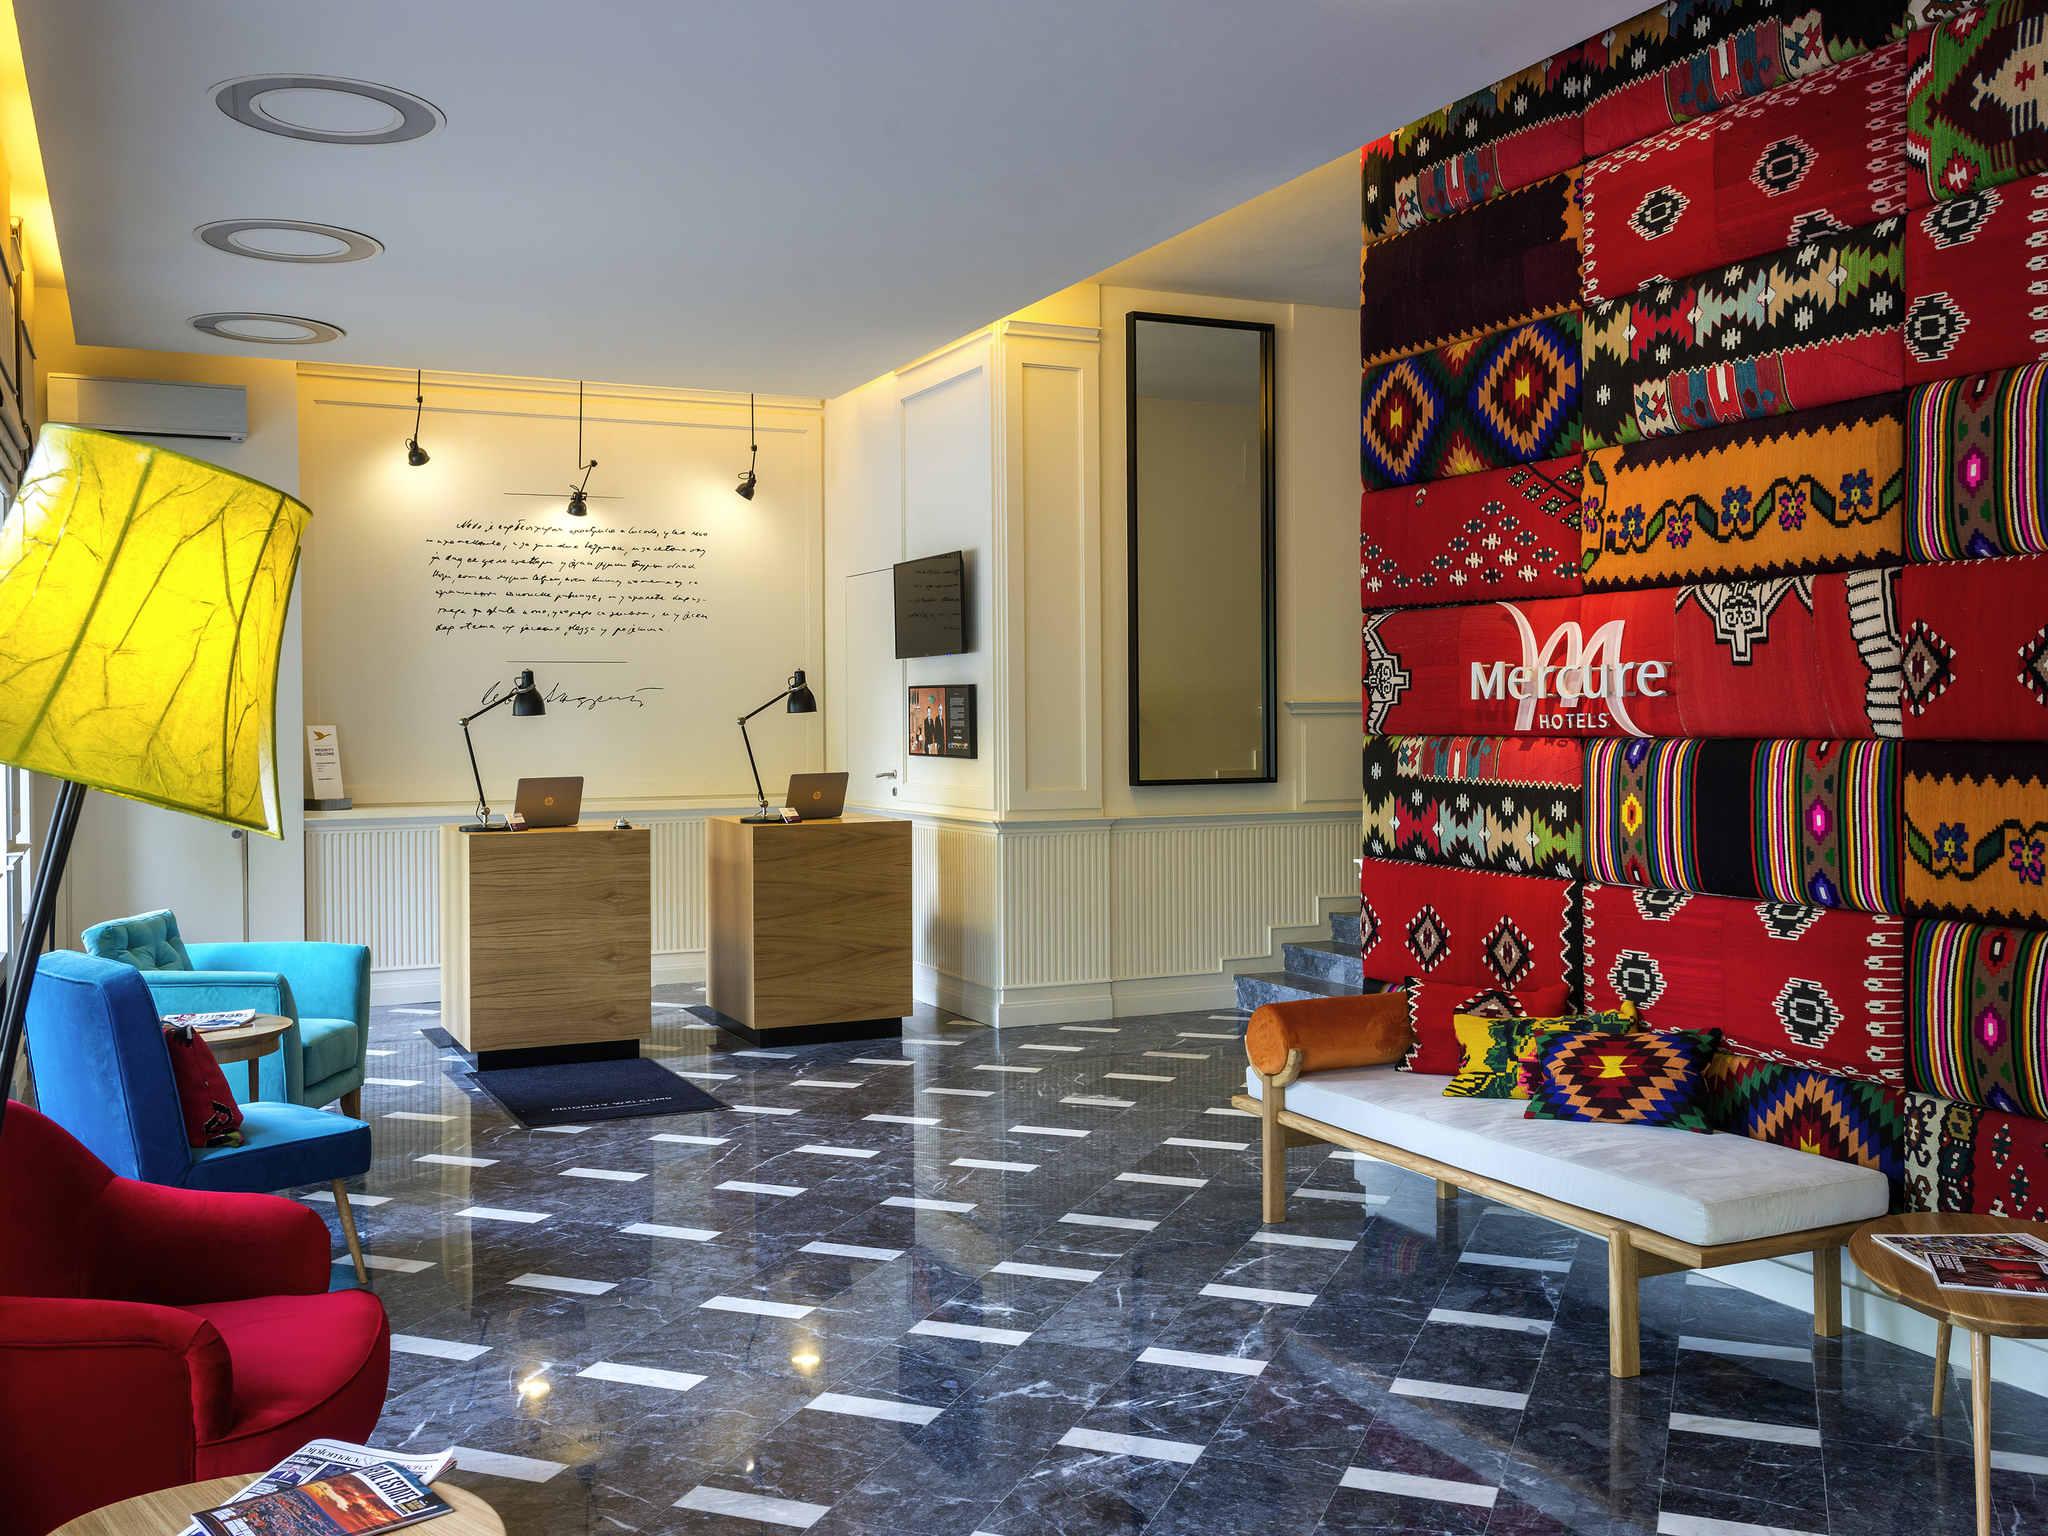 فندق - فندق Mercure بلغراد إكسيلسيور